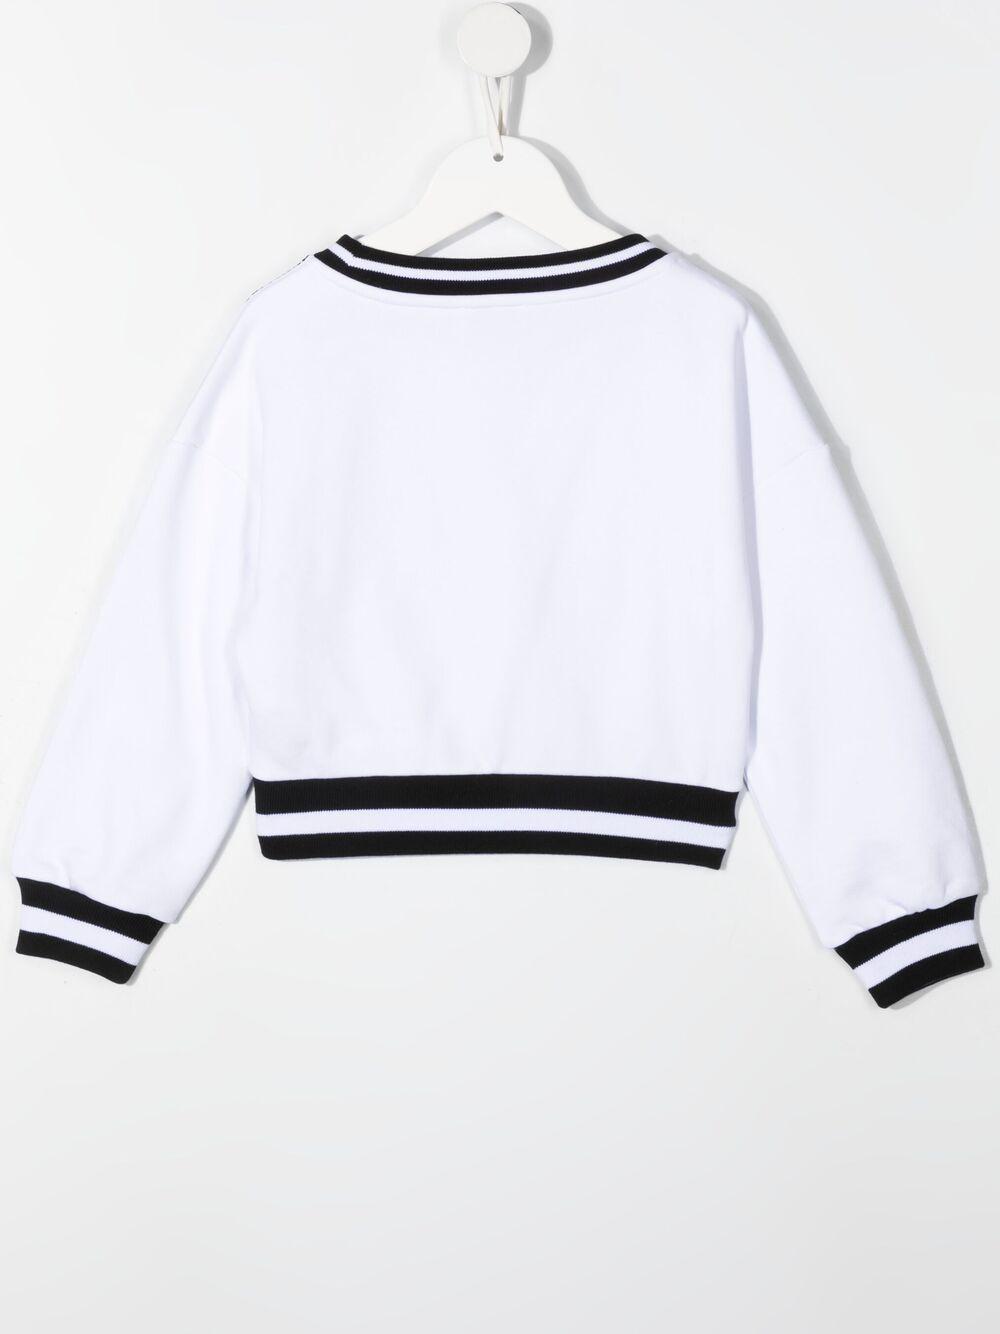 MONNALISA | Sweatshirt | 197608SO70020099